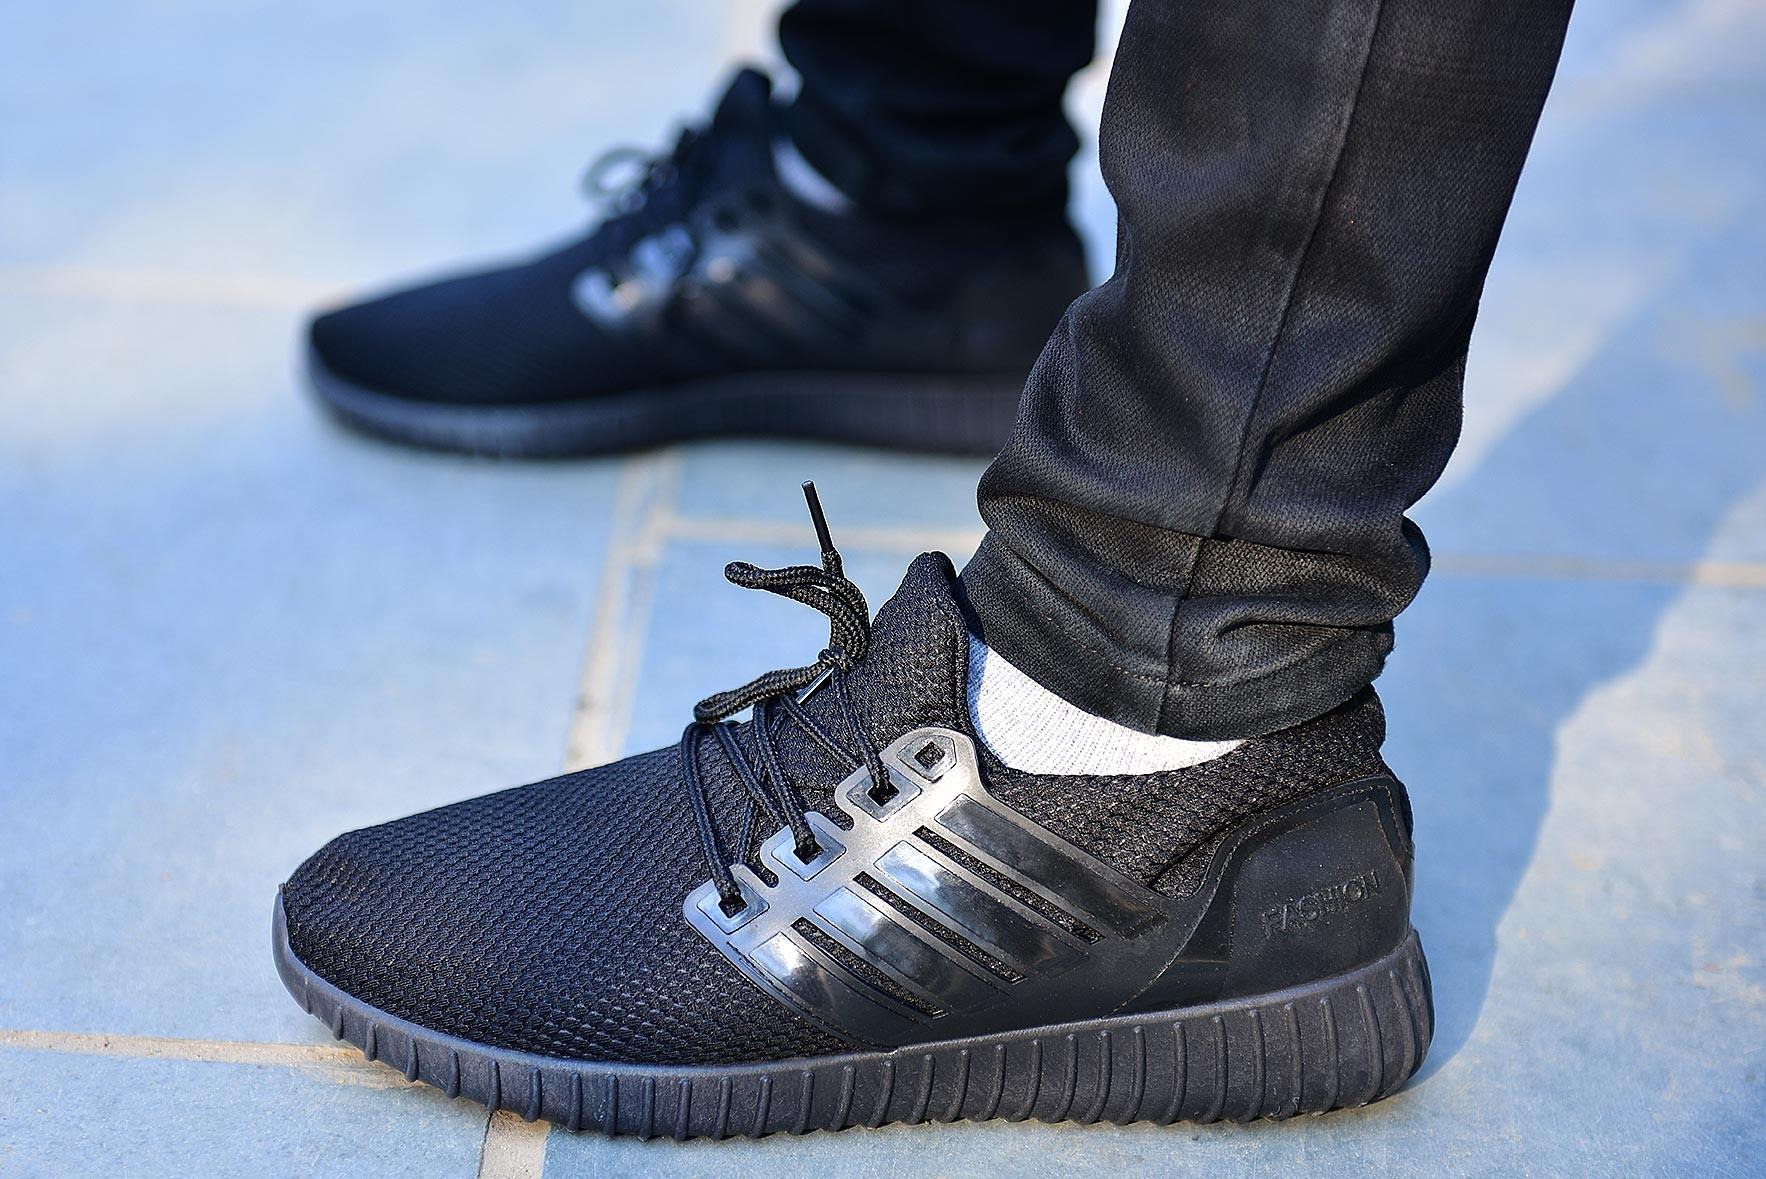 Crazy to walk shoes